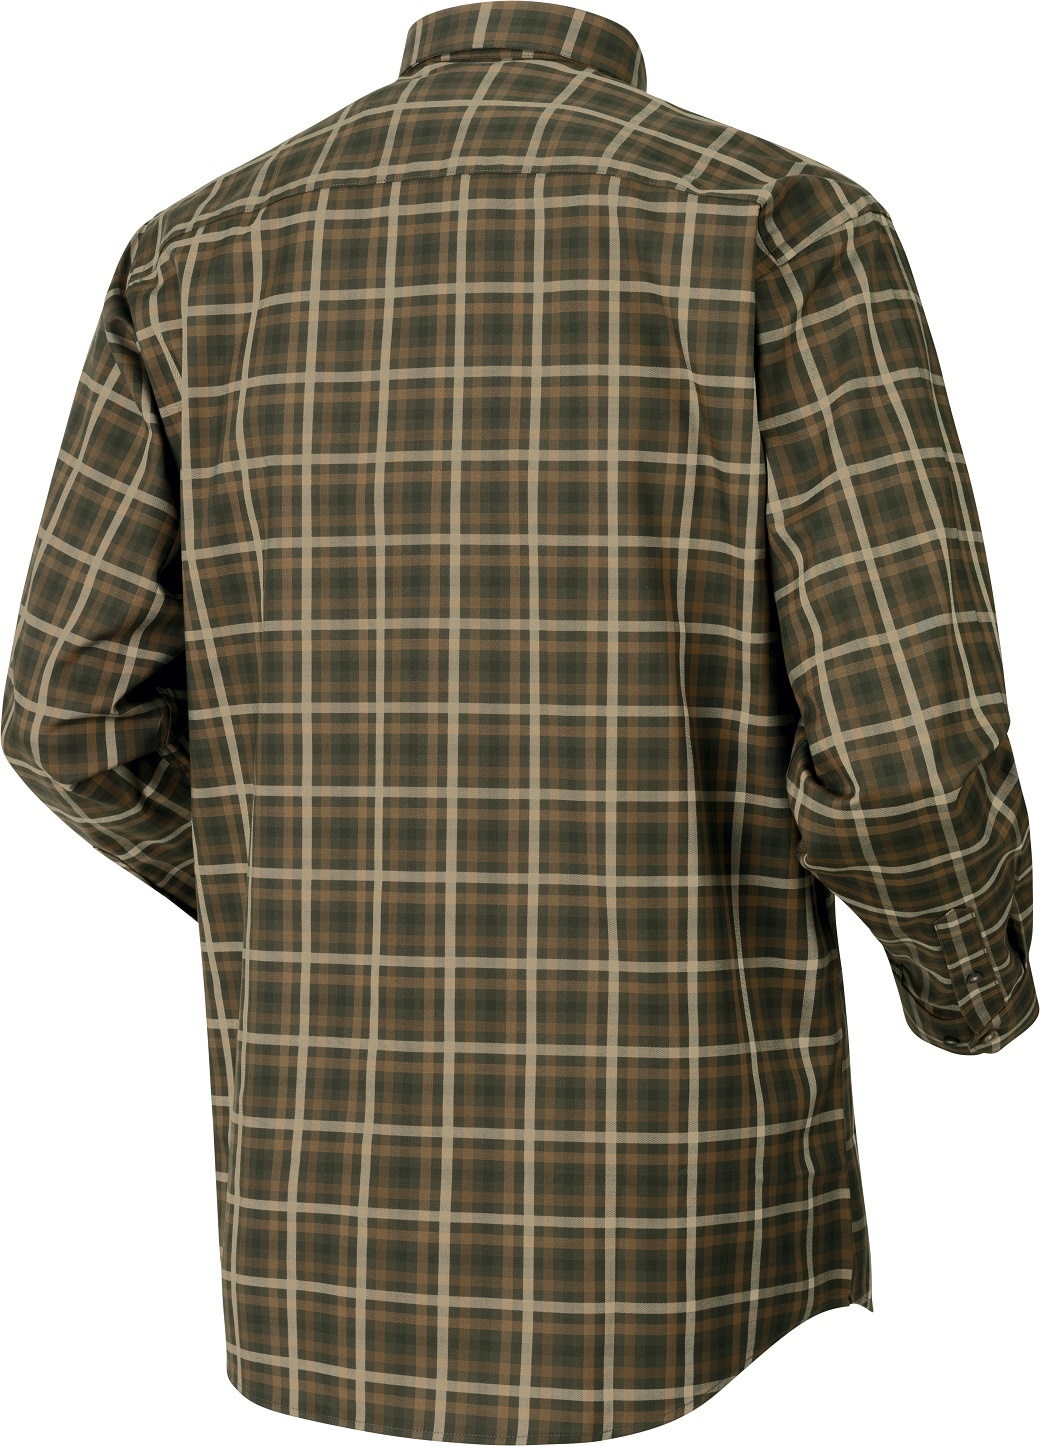 Härkila Milford Shirt Willow Green Check-2